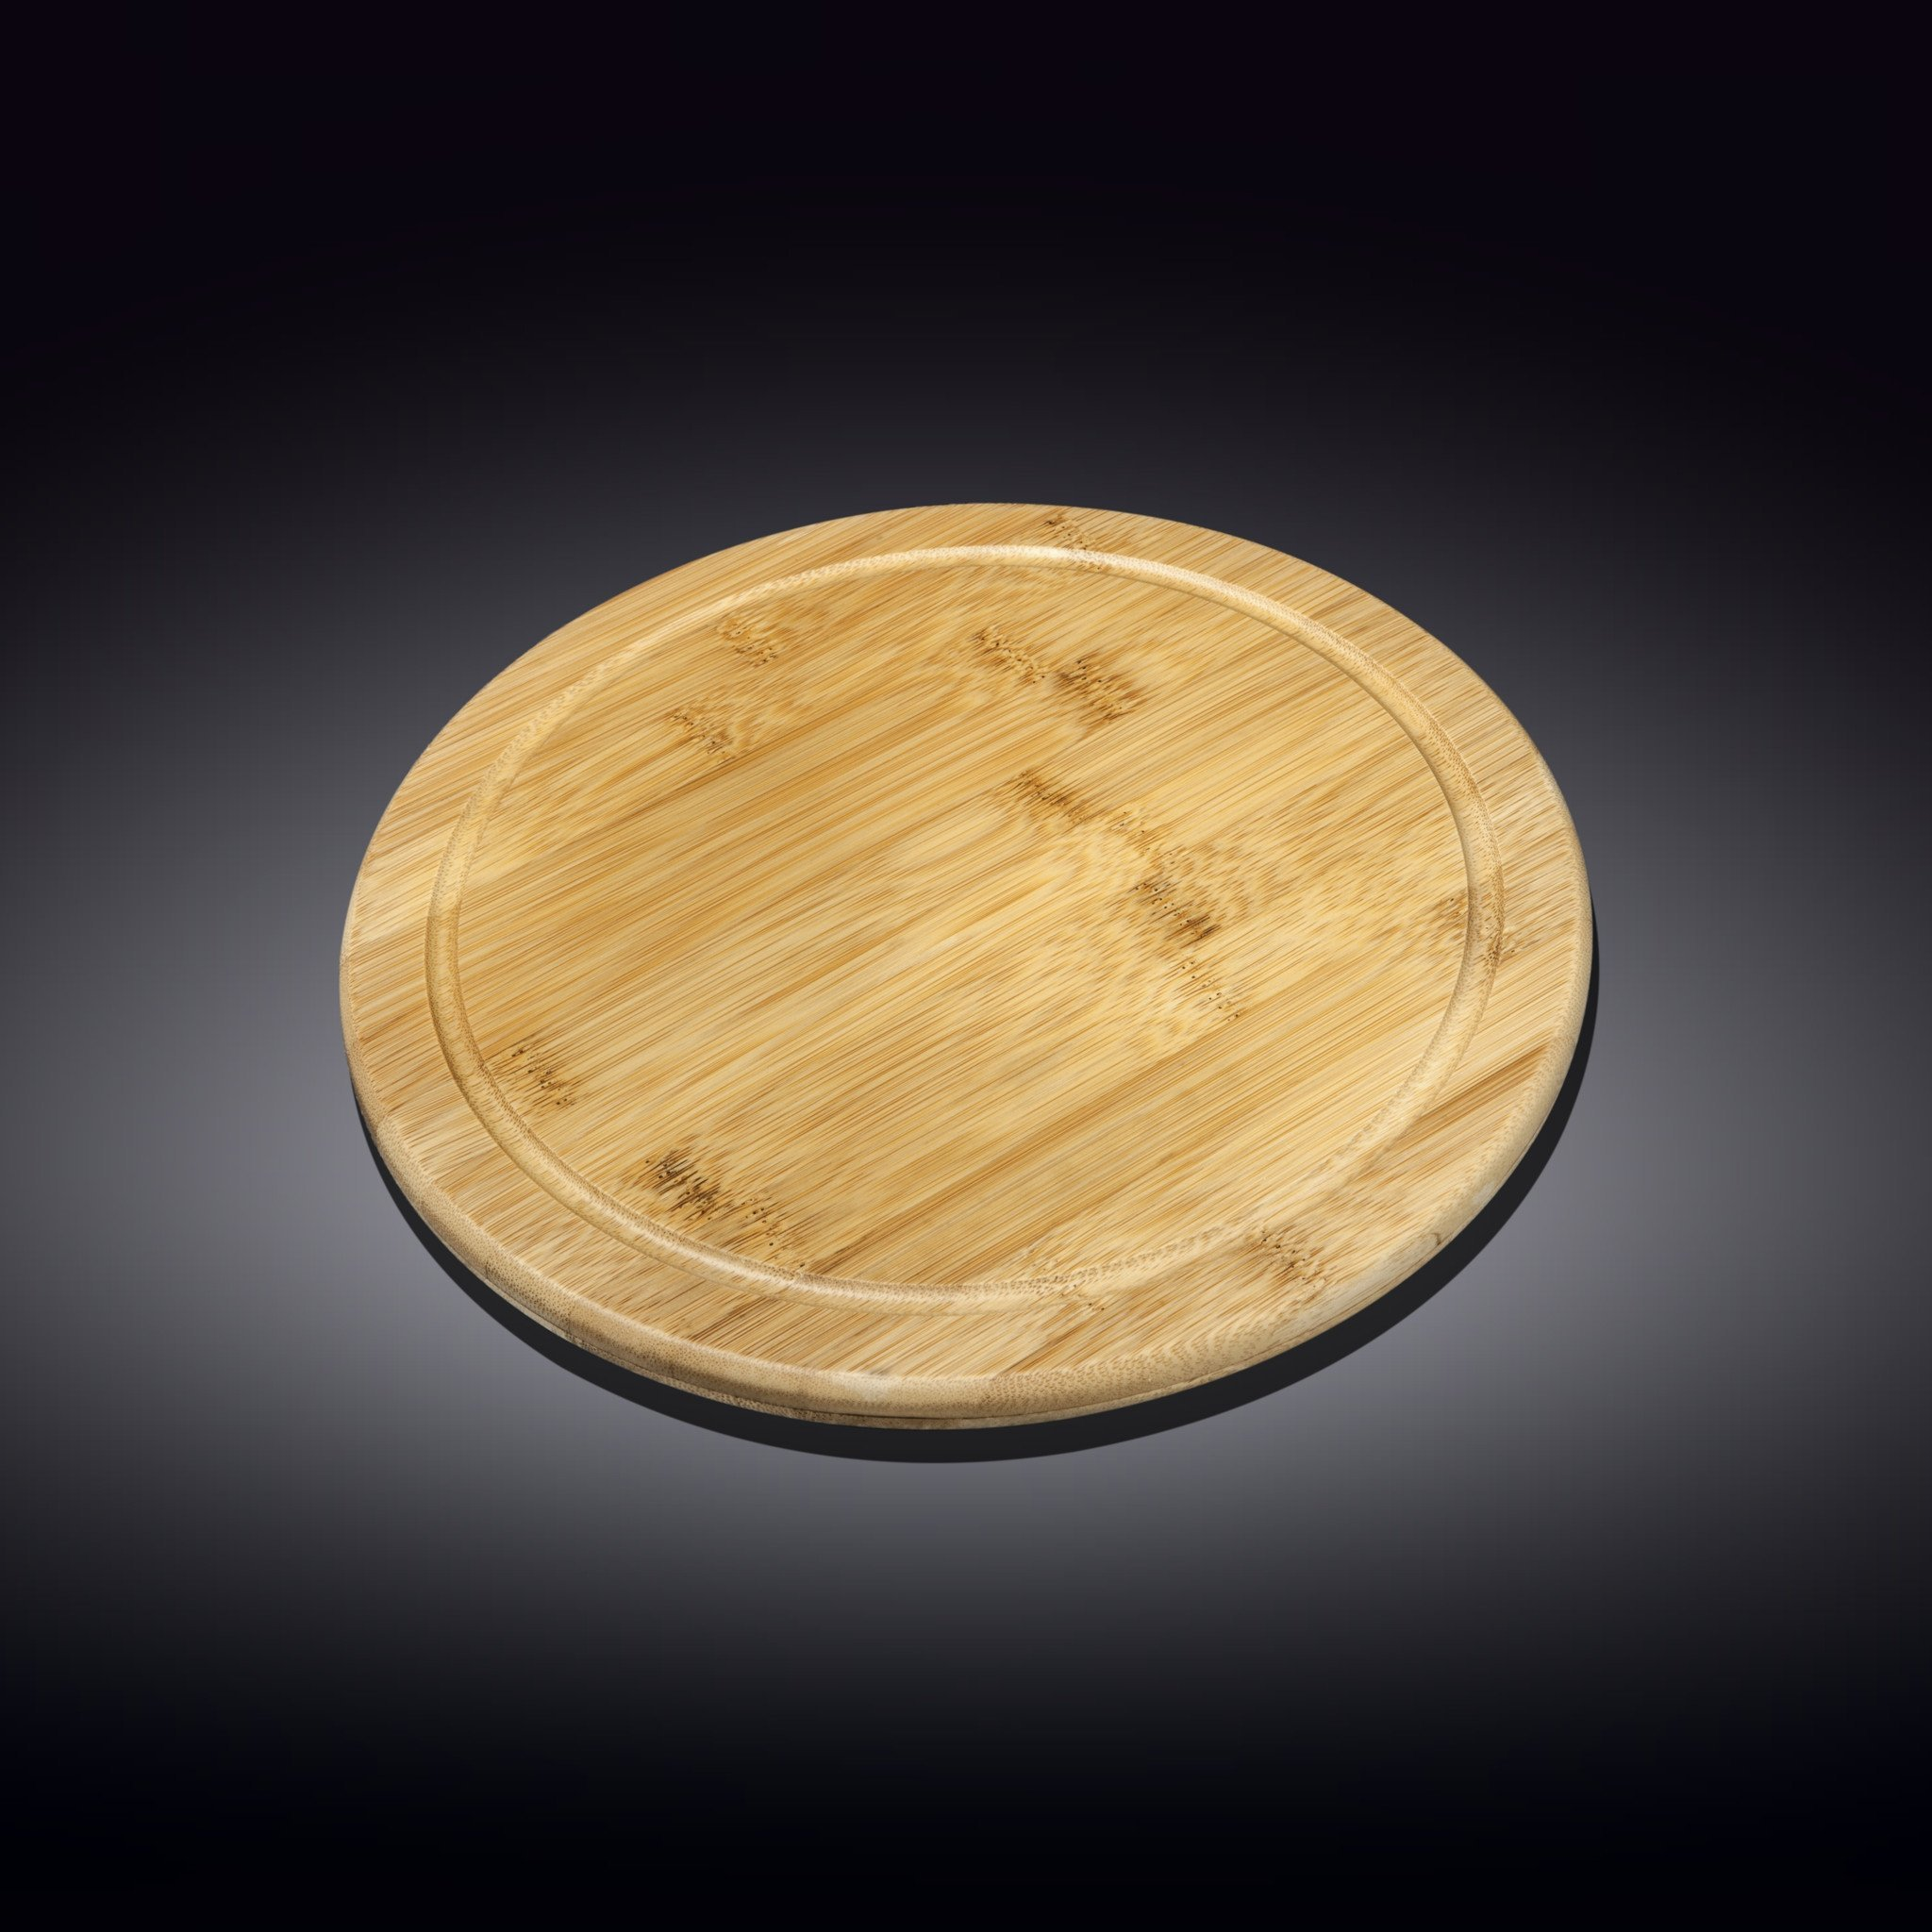 Сервировочная подставка 35.5см  Бамбук Wilmax  круглая